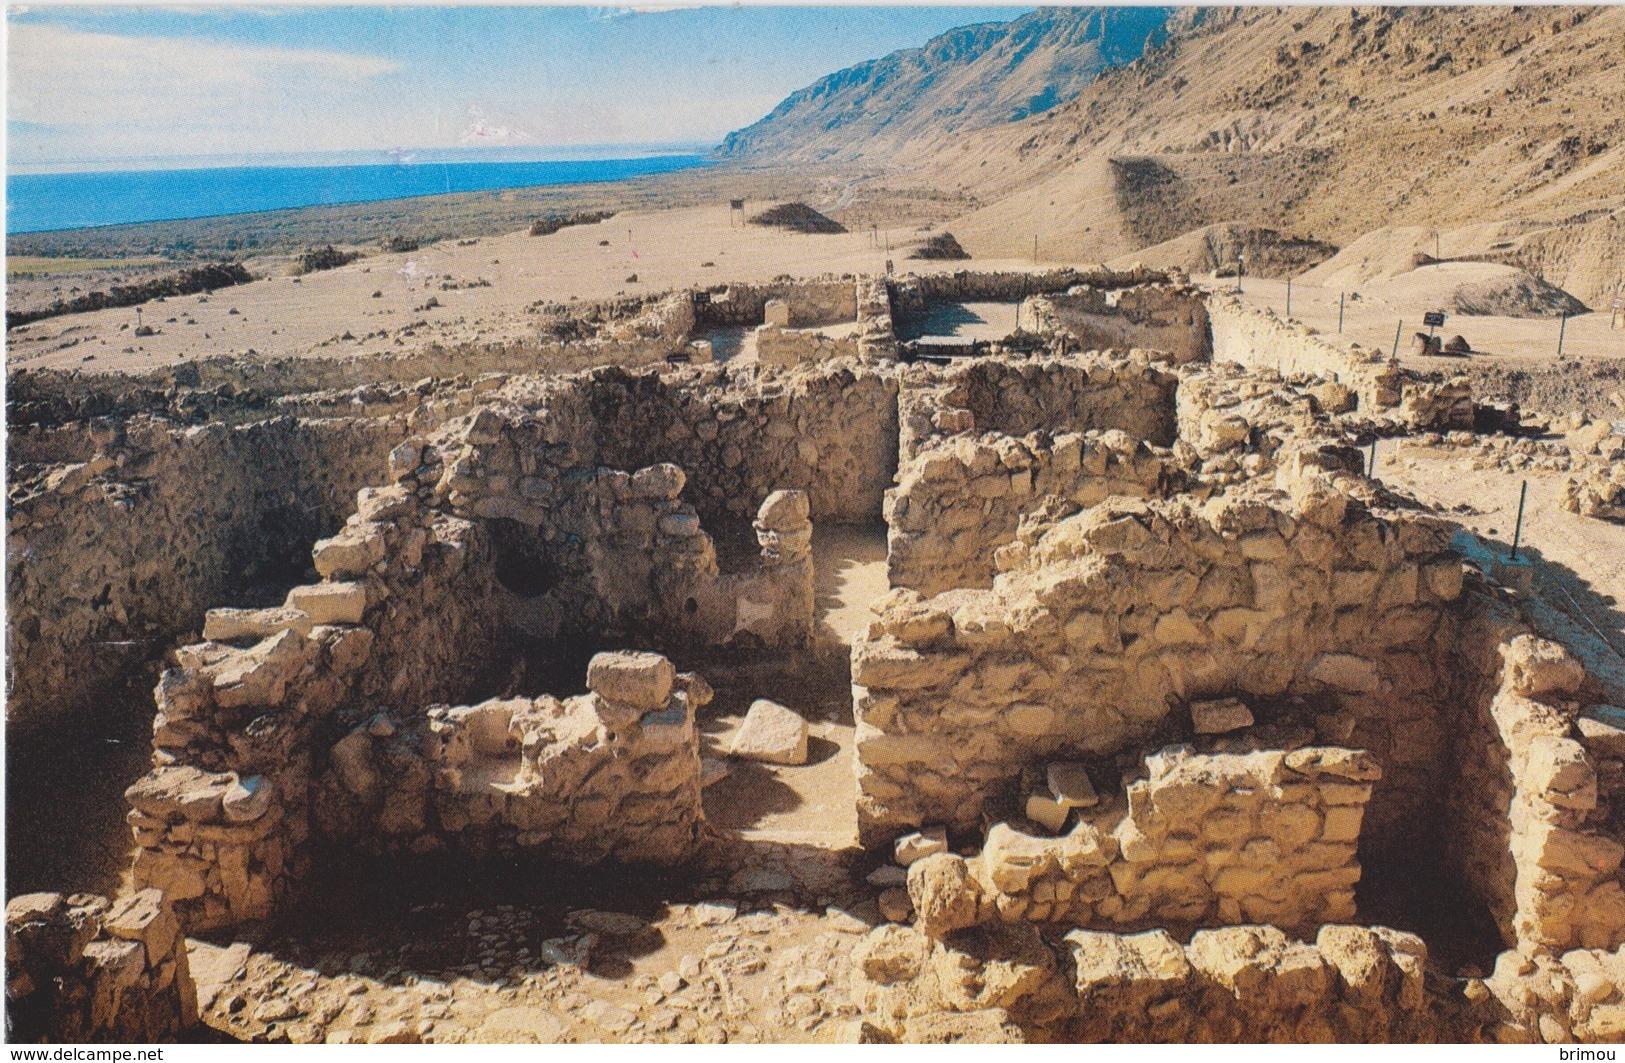 Jordanie, Qumran, Carte Postale Circulée. - Jordanie